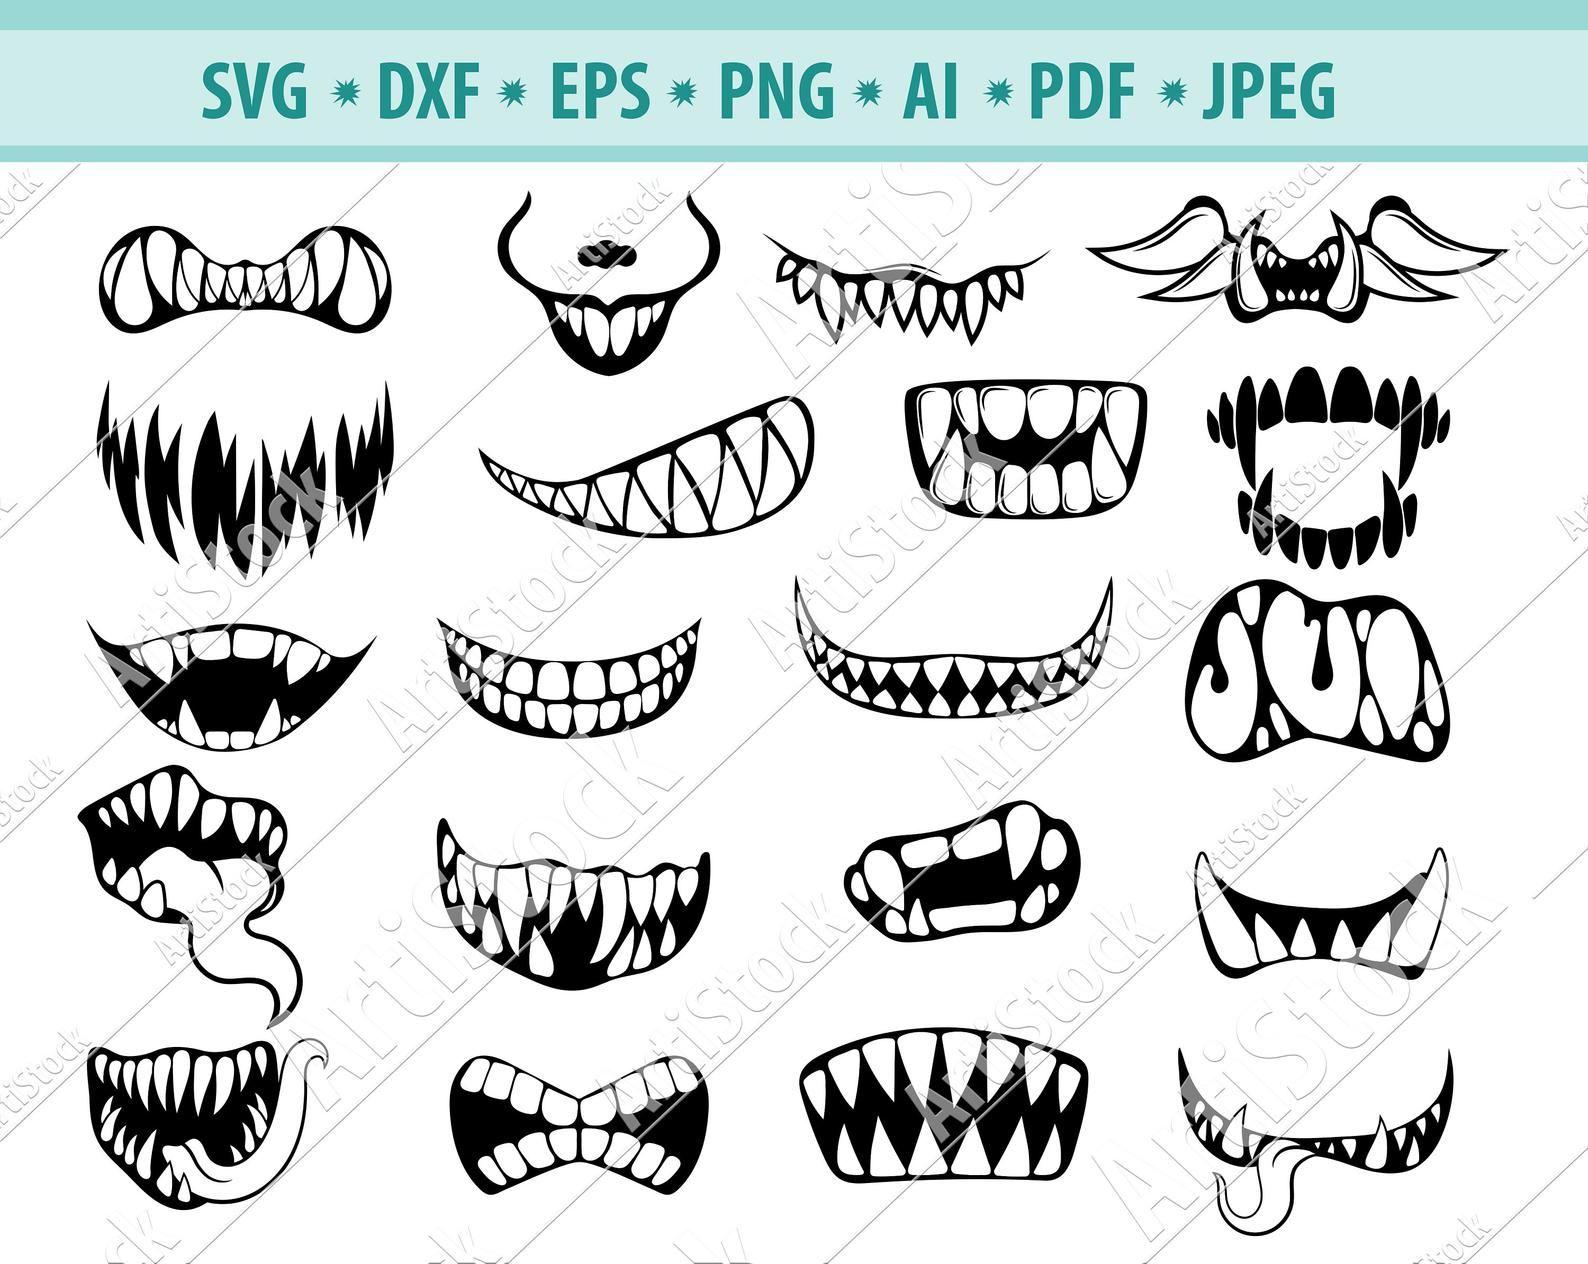 How To Draw Sharp Teeth And Have Them Make Sense A Tutorial Drawings Teeth Drawing Animal Drawings